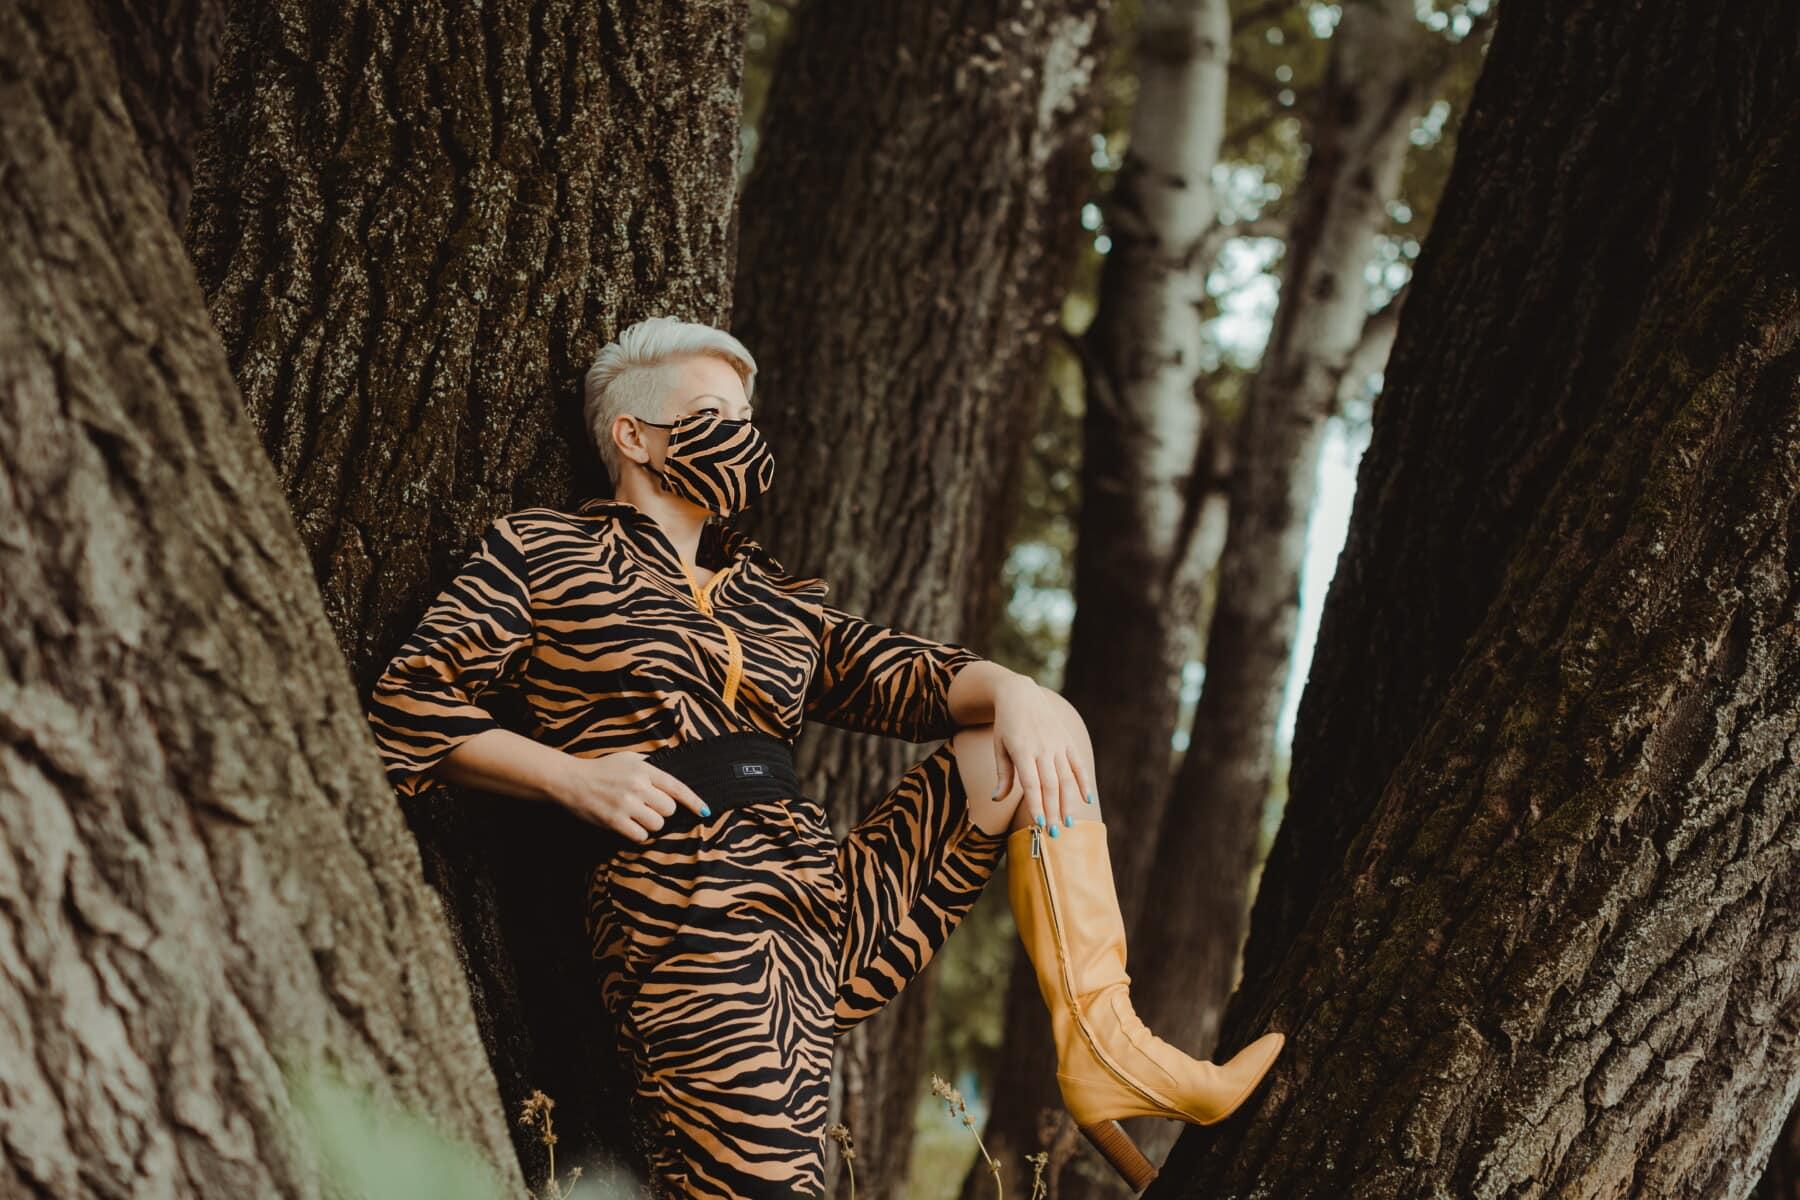 herrlich, junge Frau, posiert, Fotomodell, Gesichtsmaske, Outfit, Mode, Camouflage, Natur, Holz